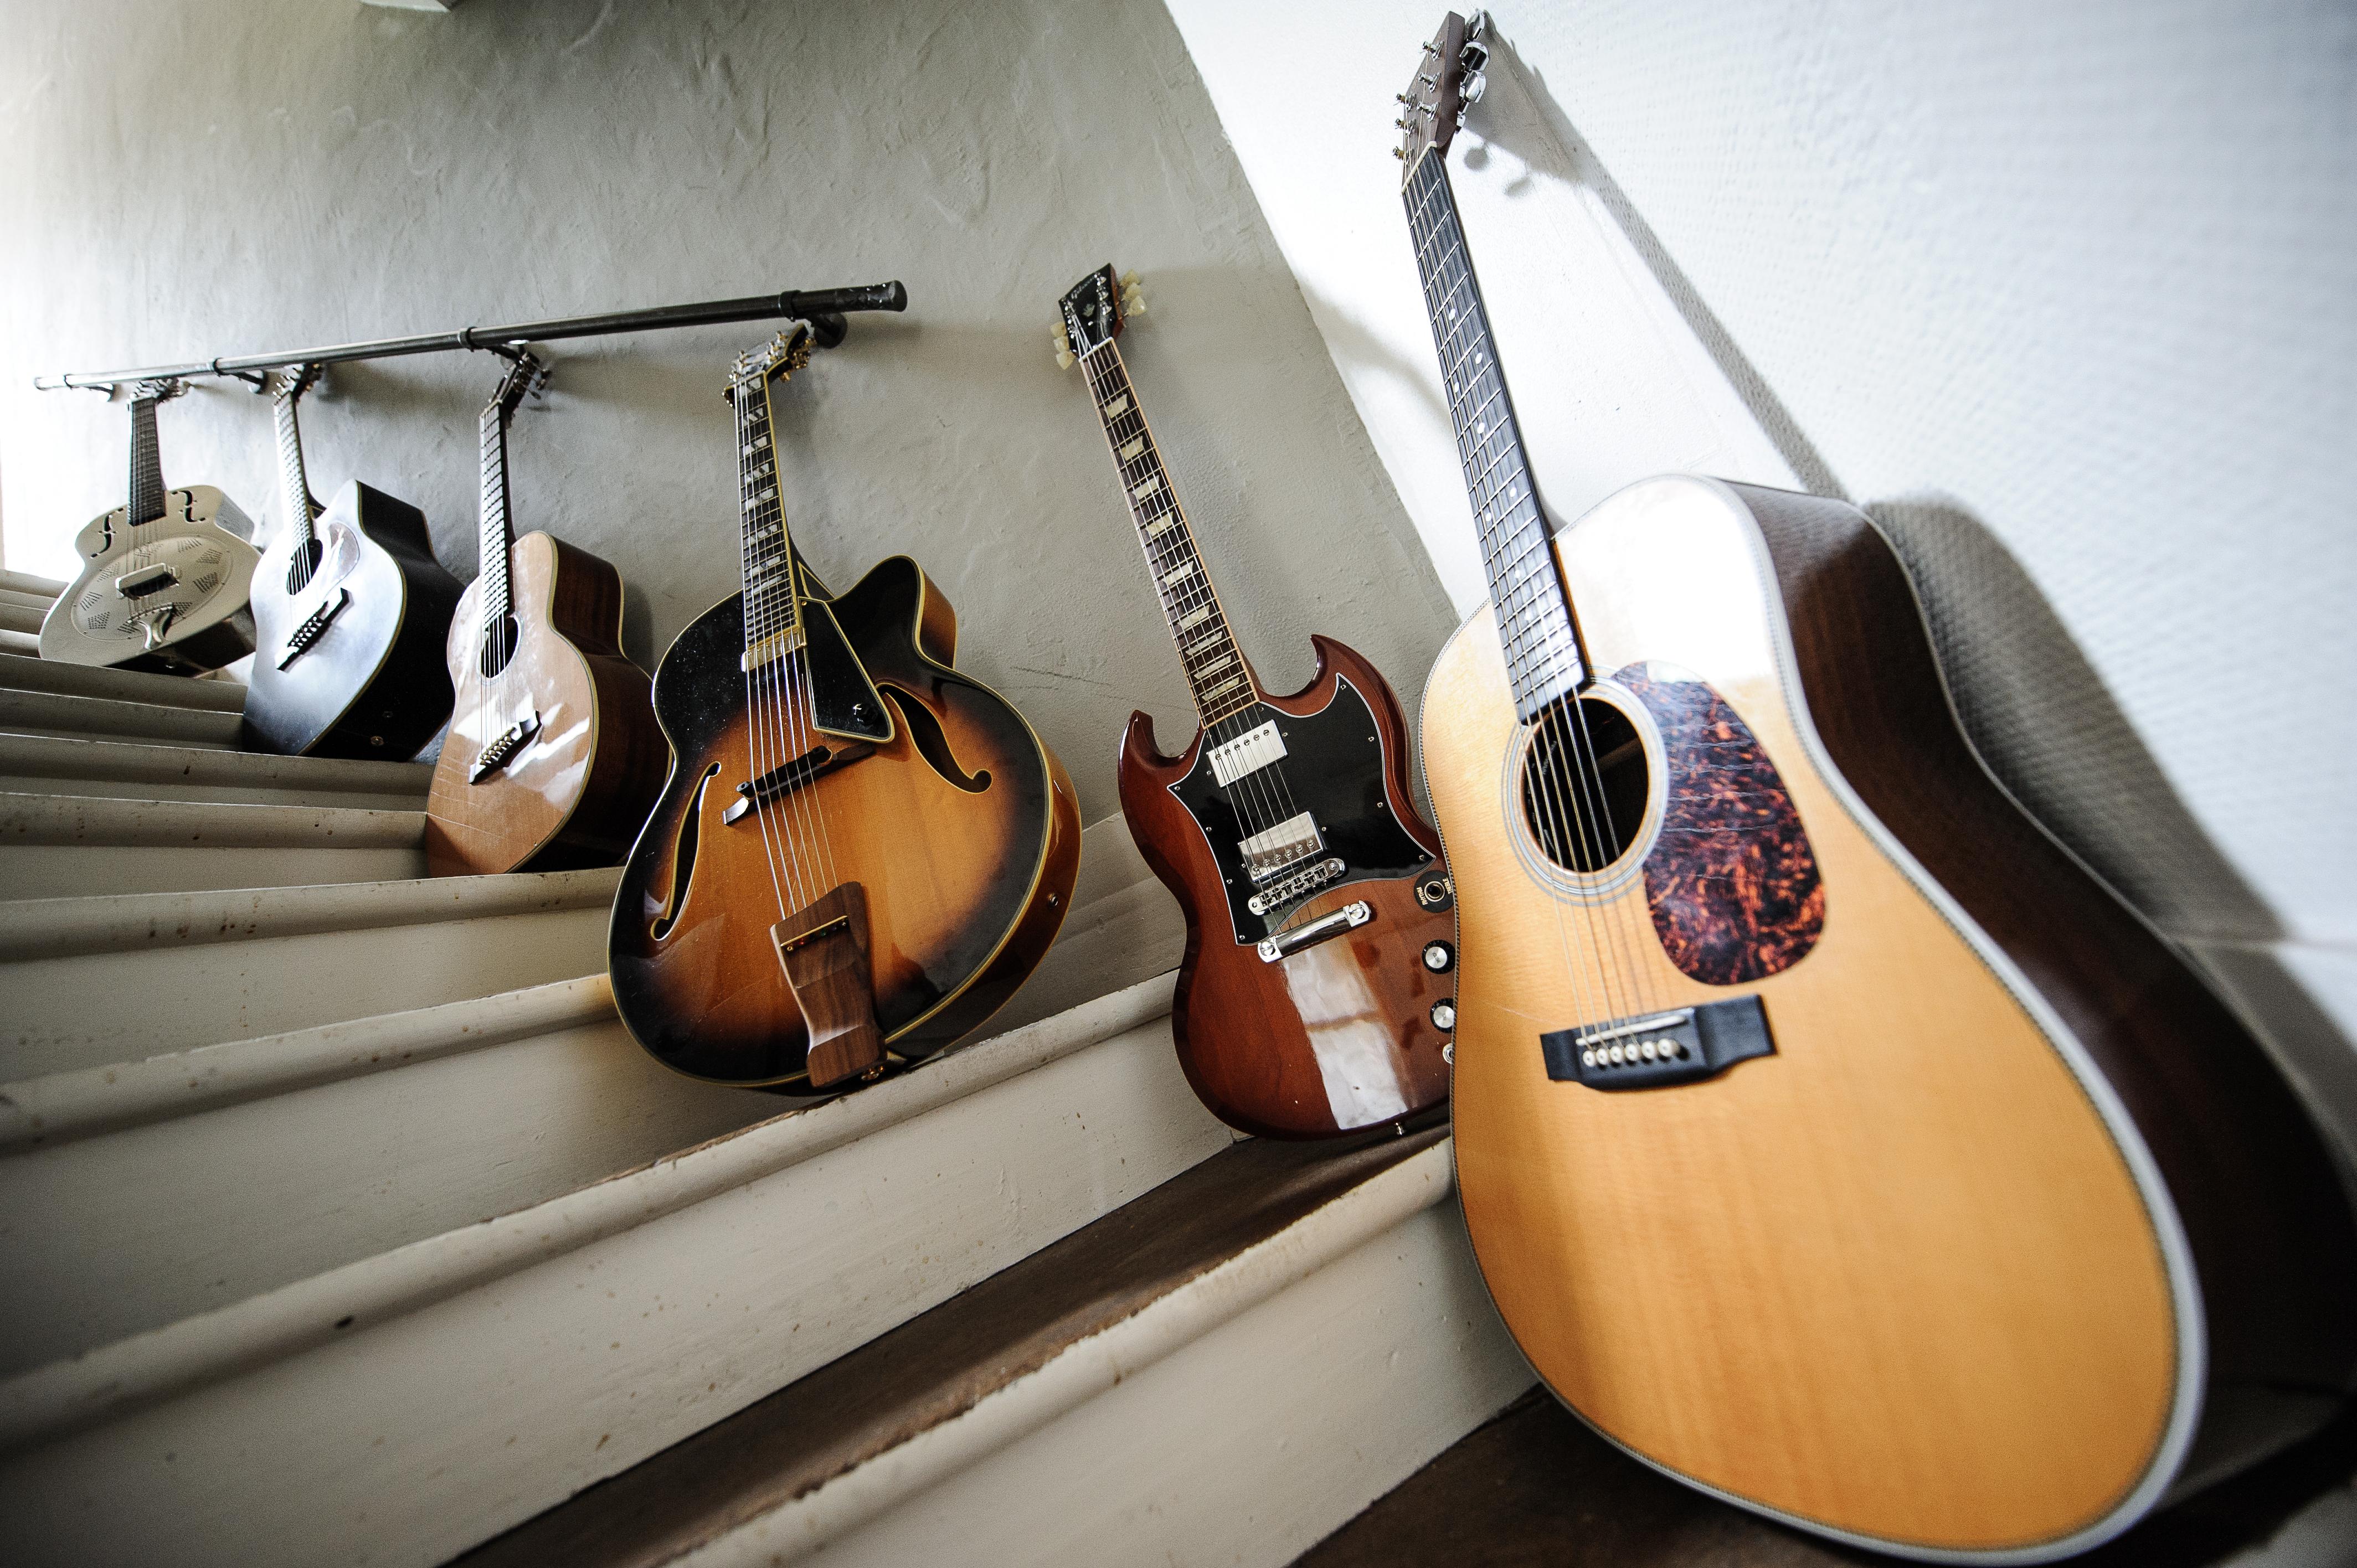 Ben-T-Zik guitar lessons